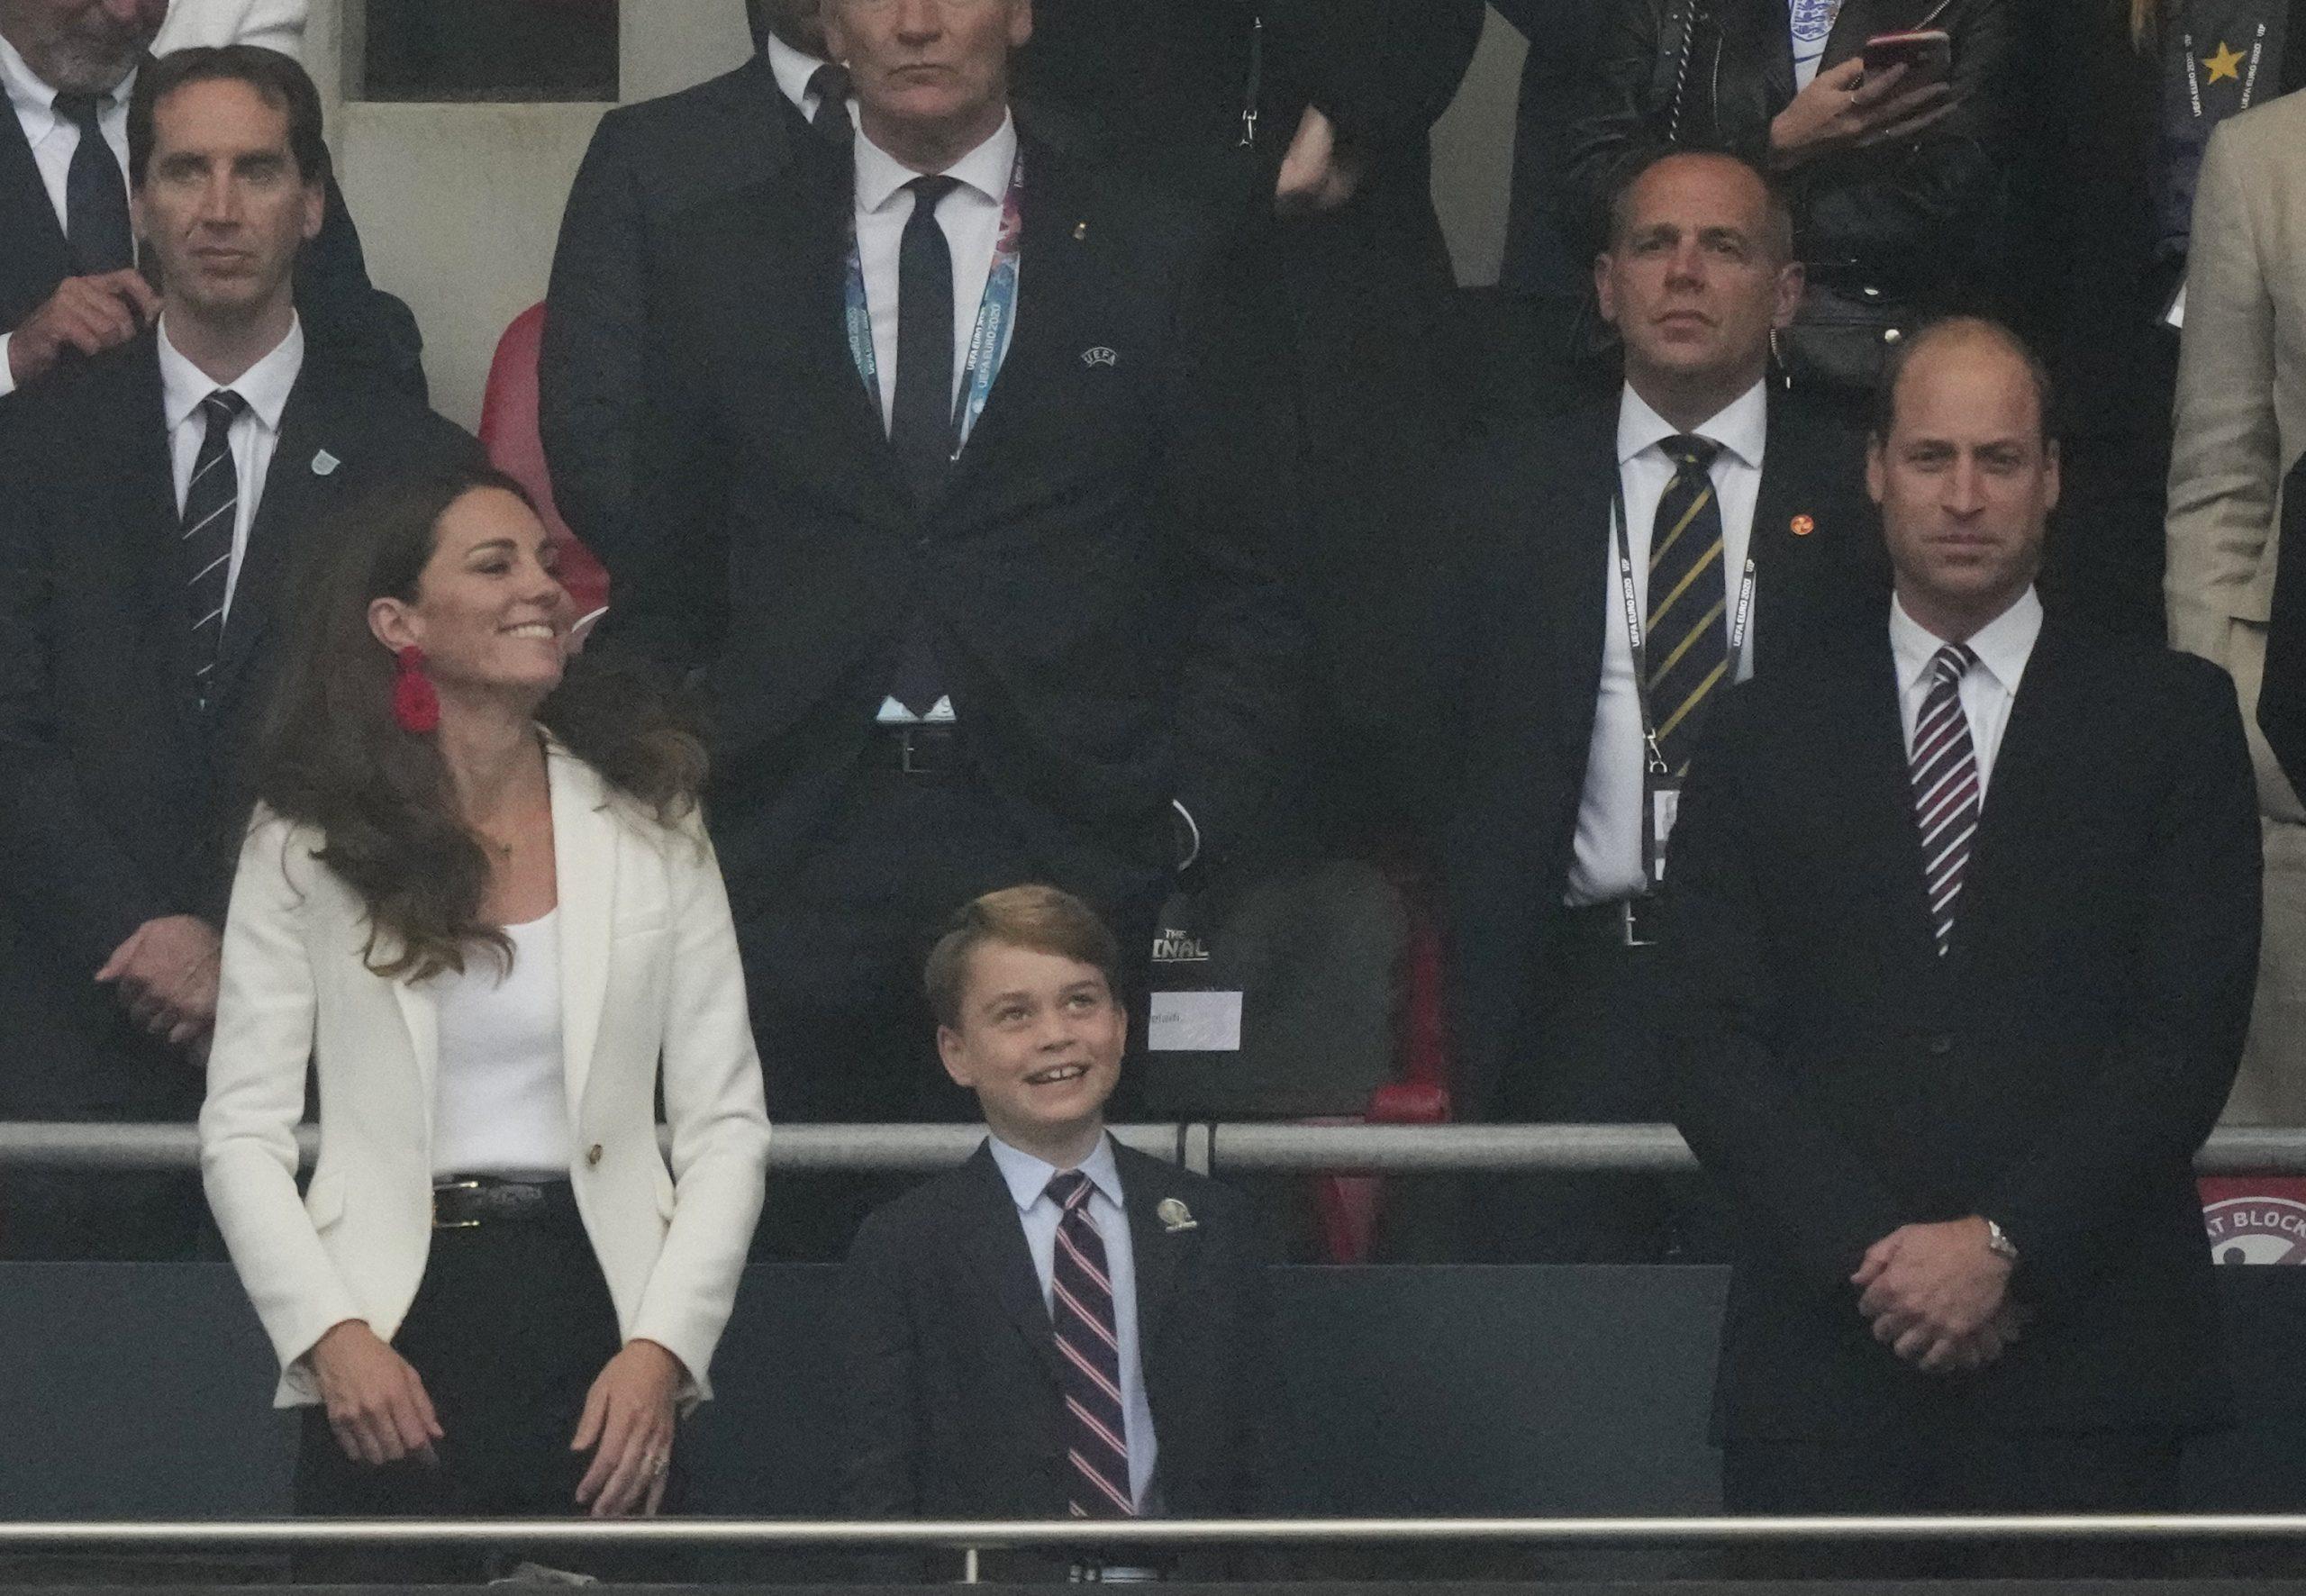 Le prince George, le prince William et Kate Middleton